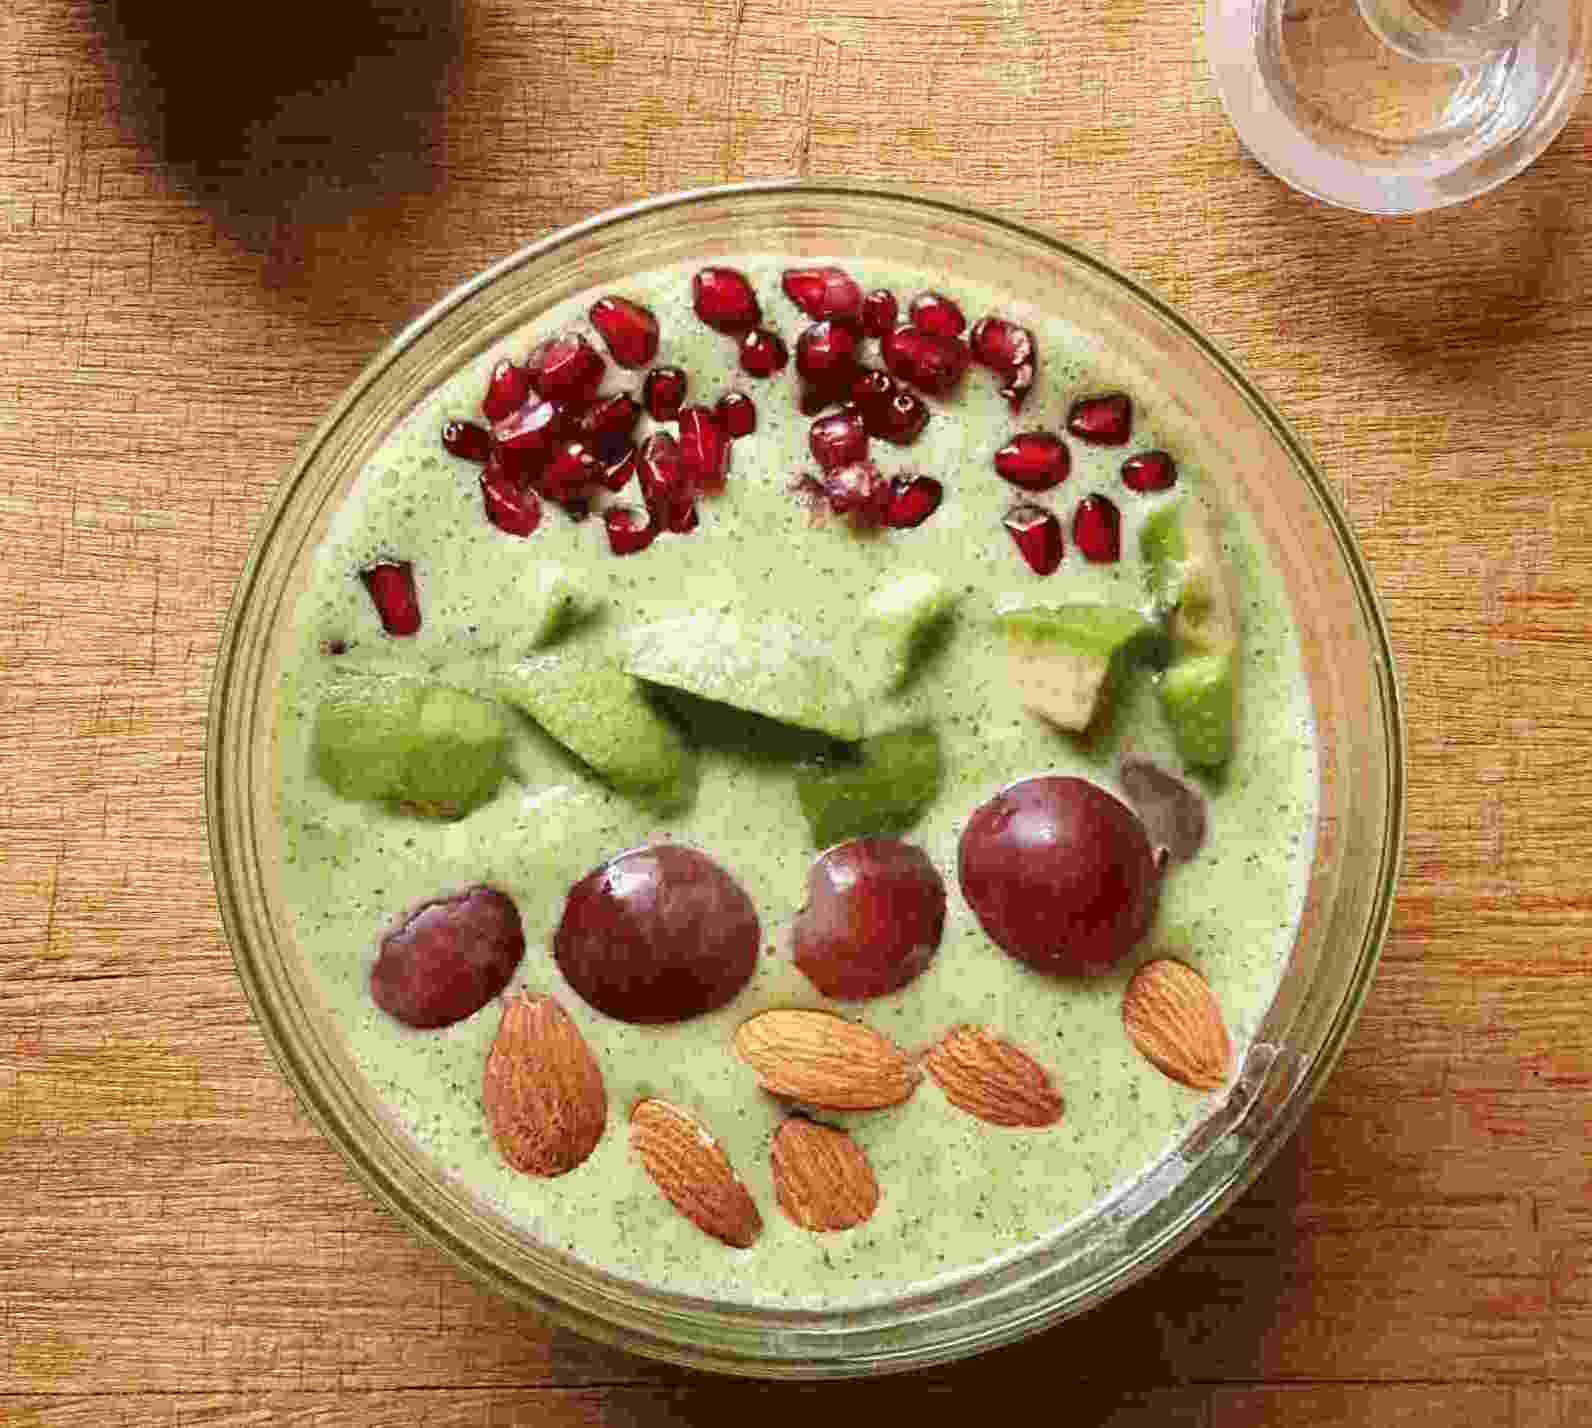 Broccoli Oats Smoothie Bowl Recipe